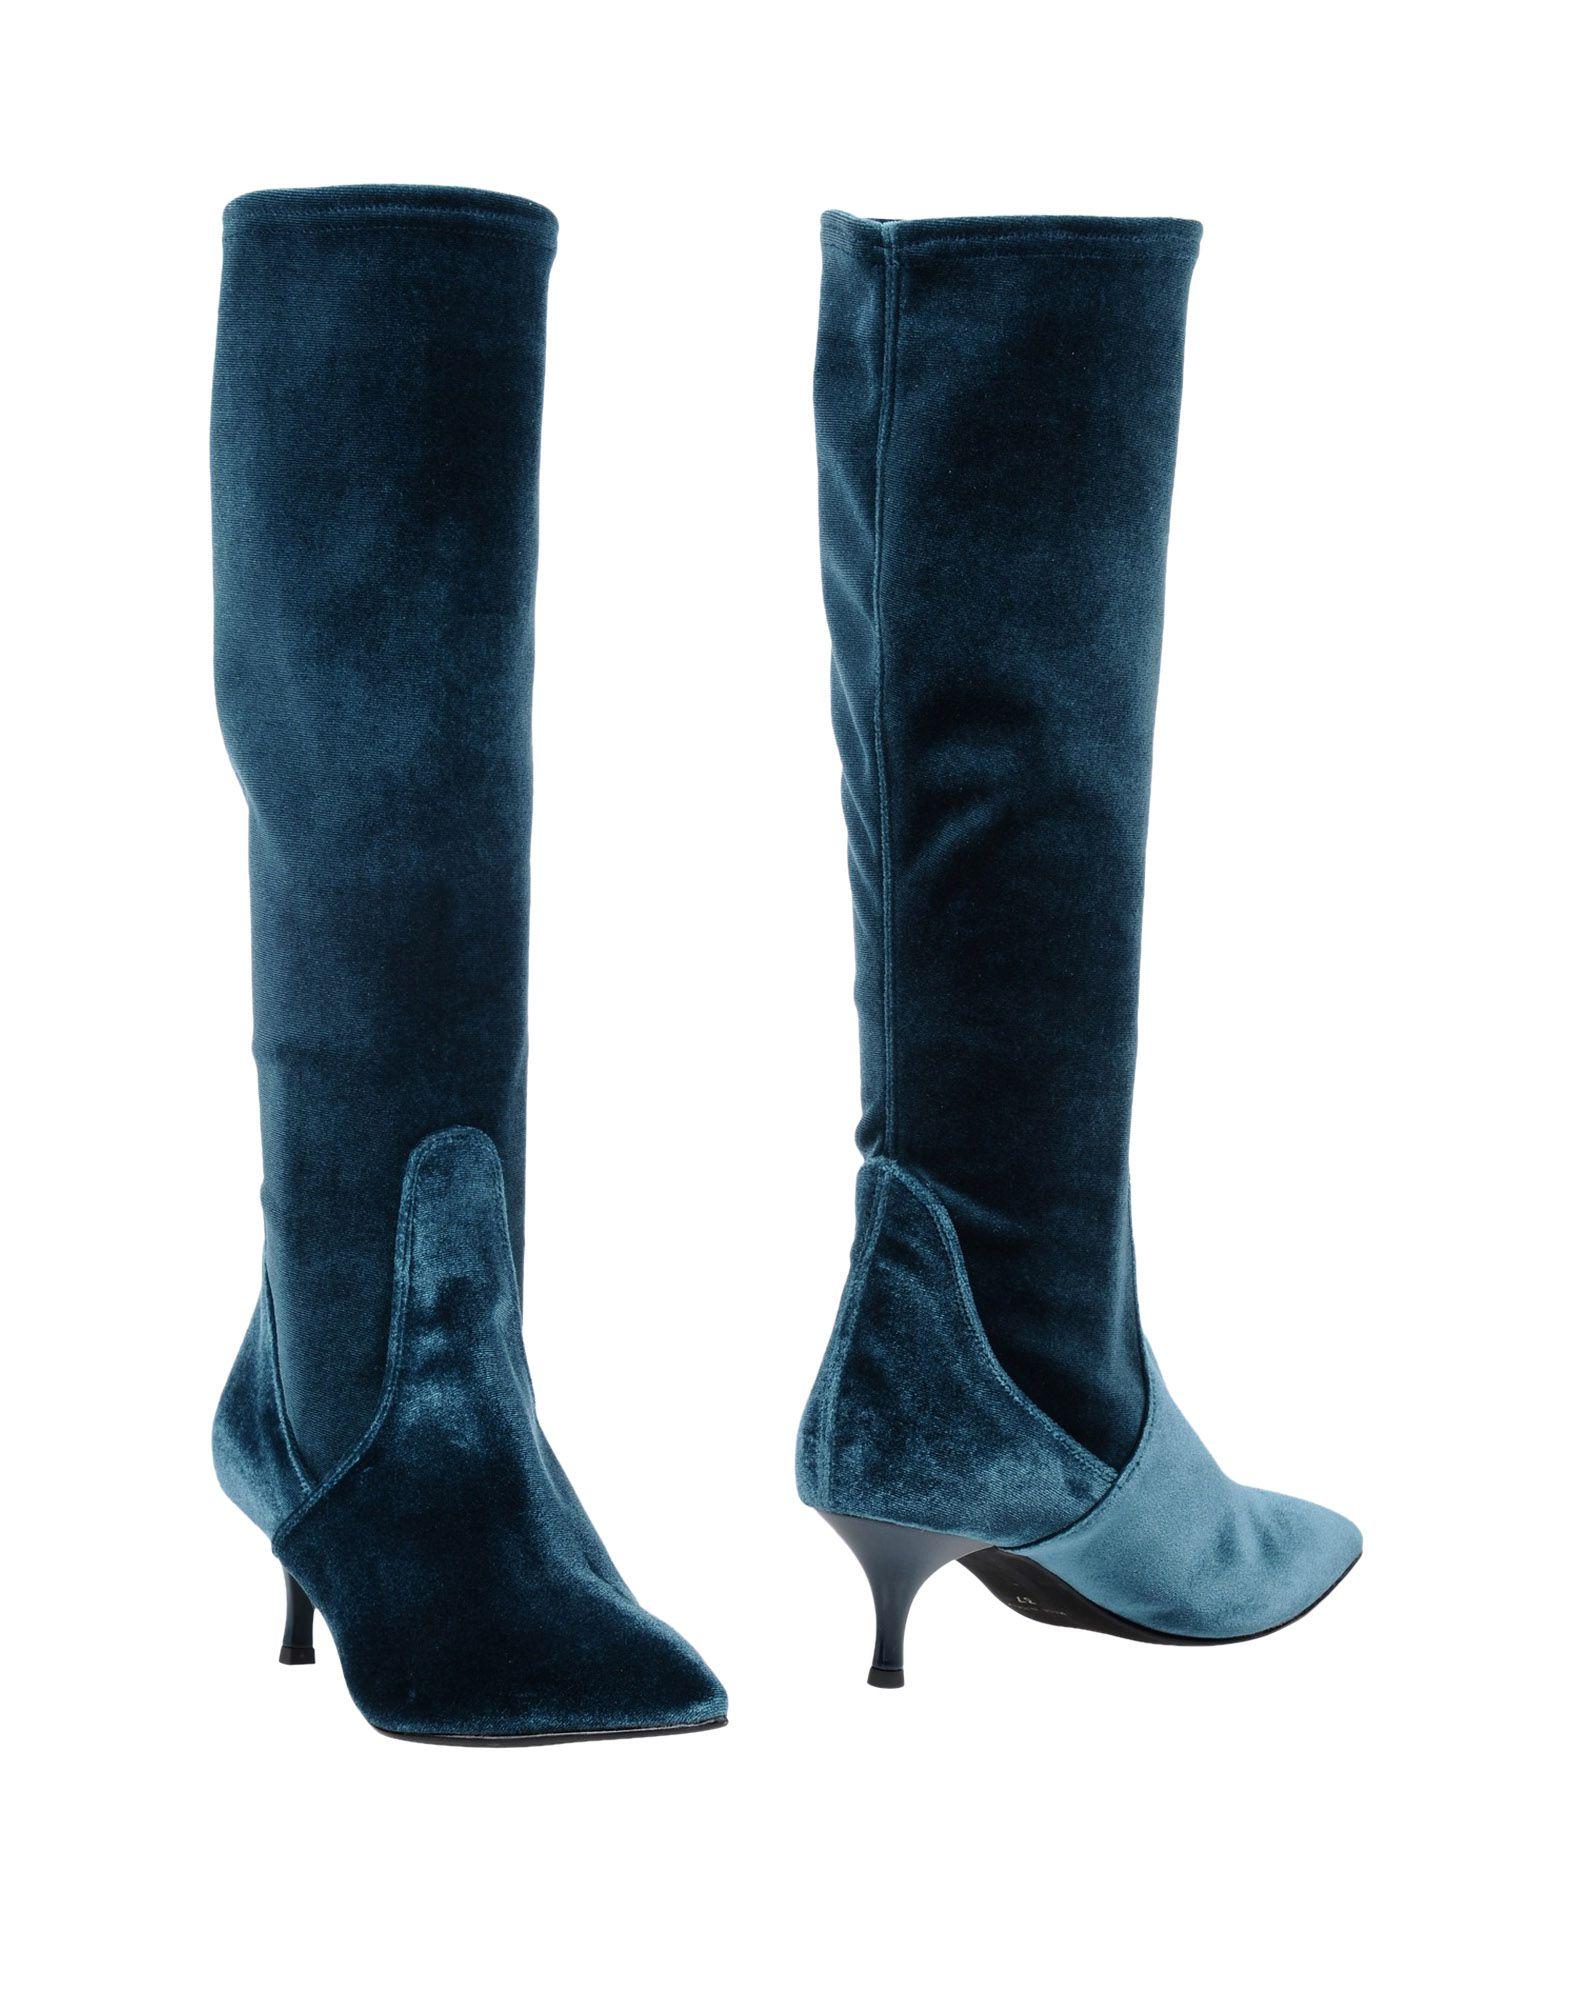 Stilvolle billige Schuhe Damen Stele Stiefel Damen Schuhe  11454572NC 1022fb